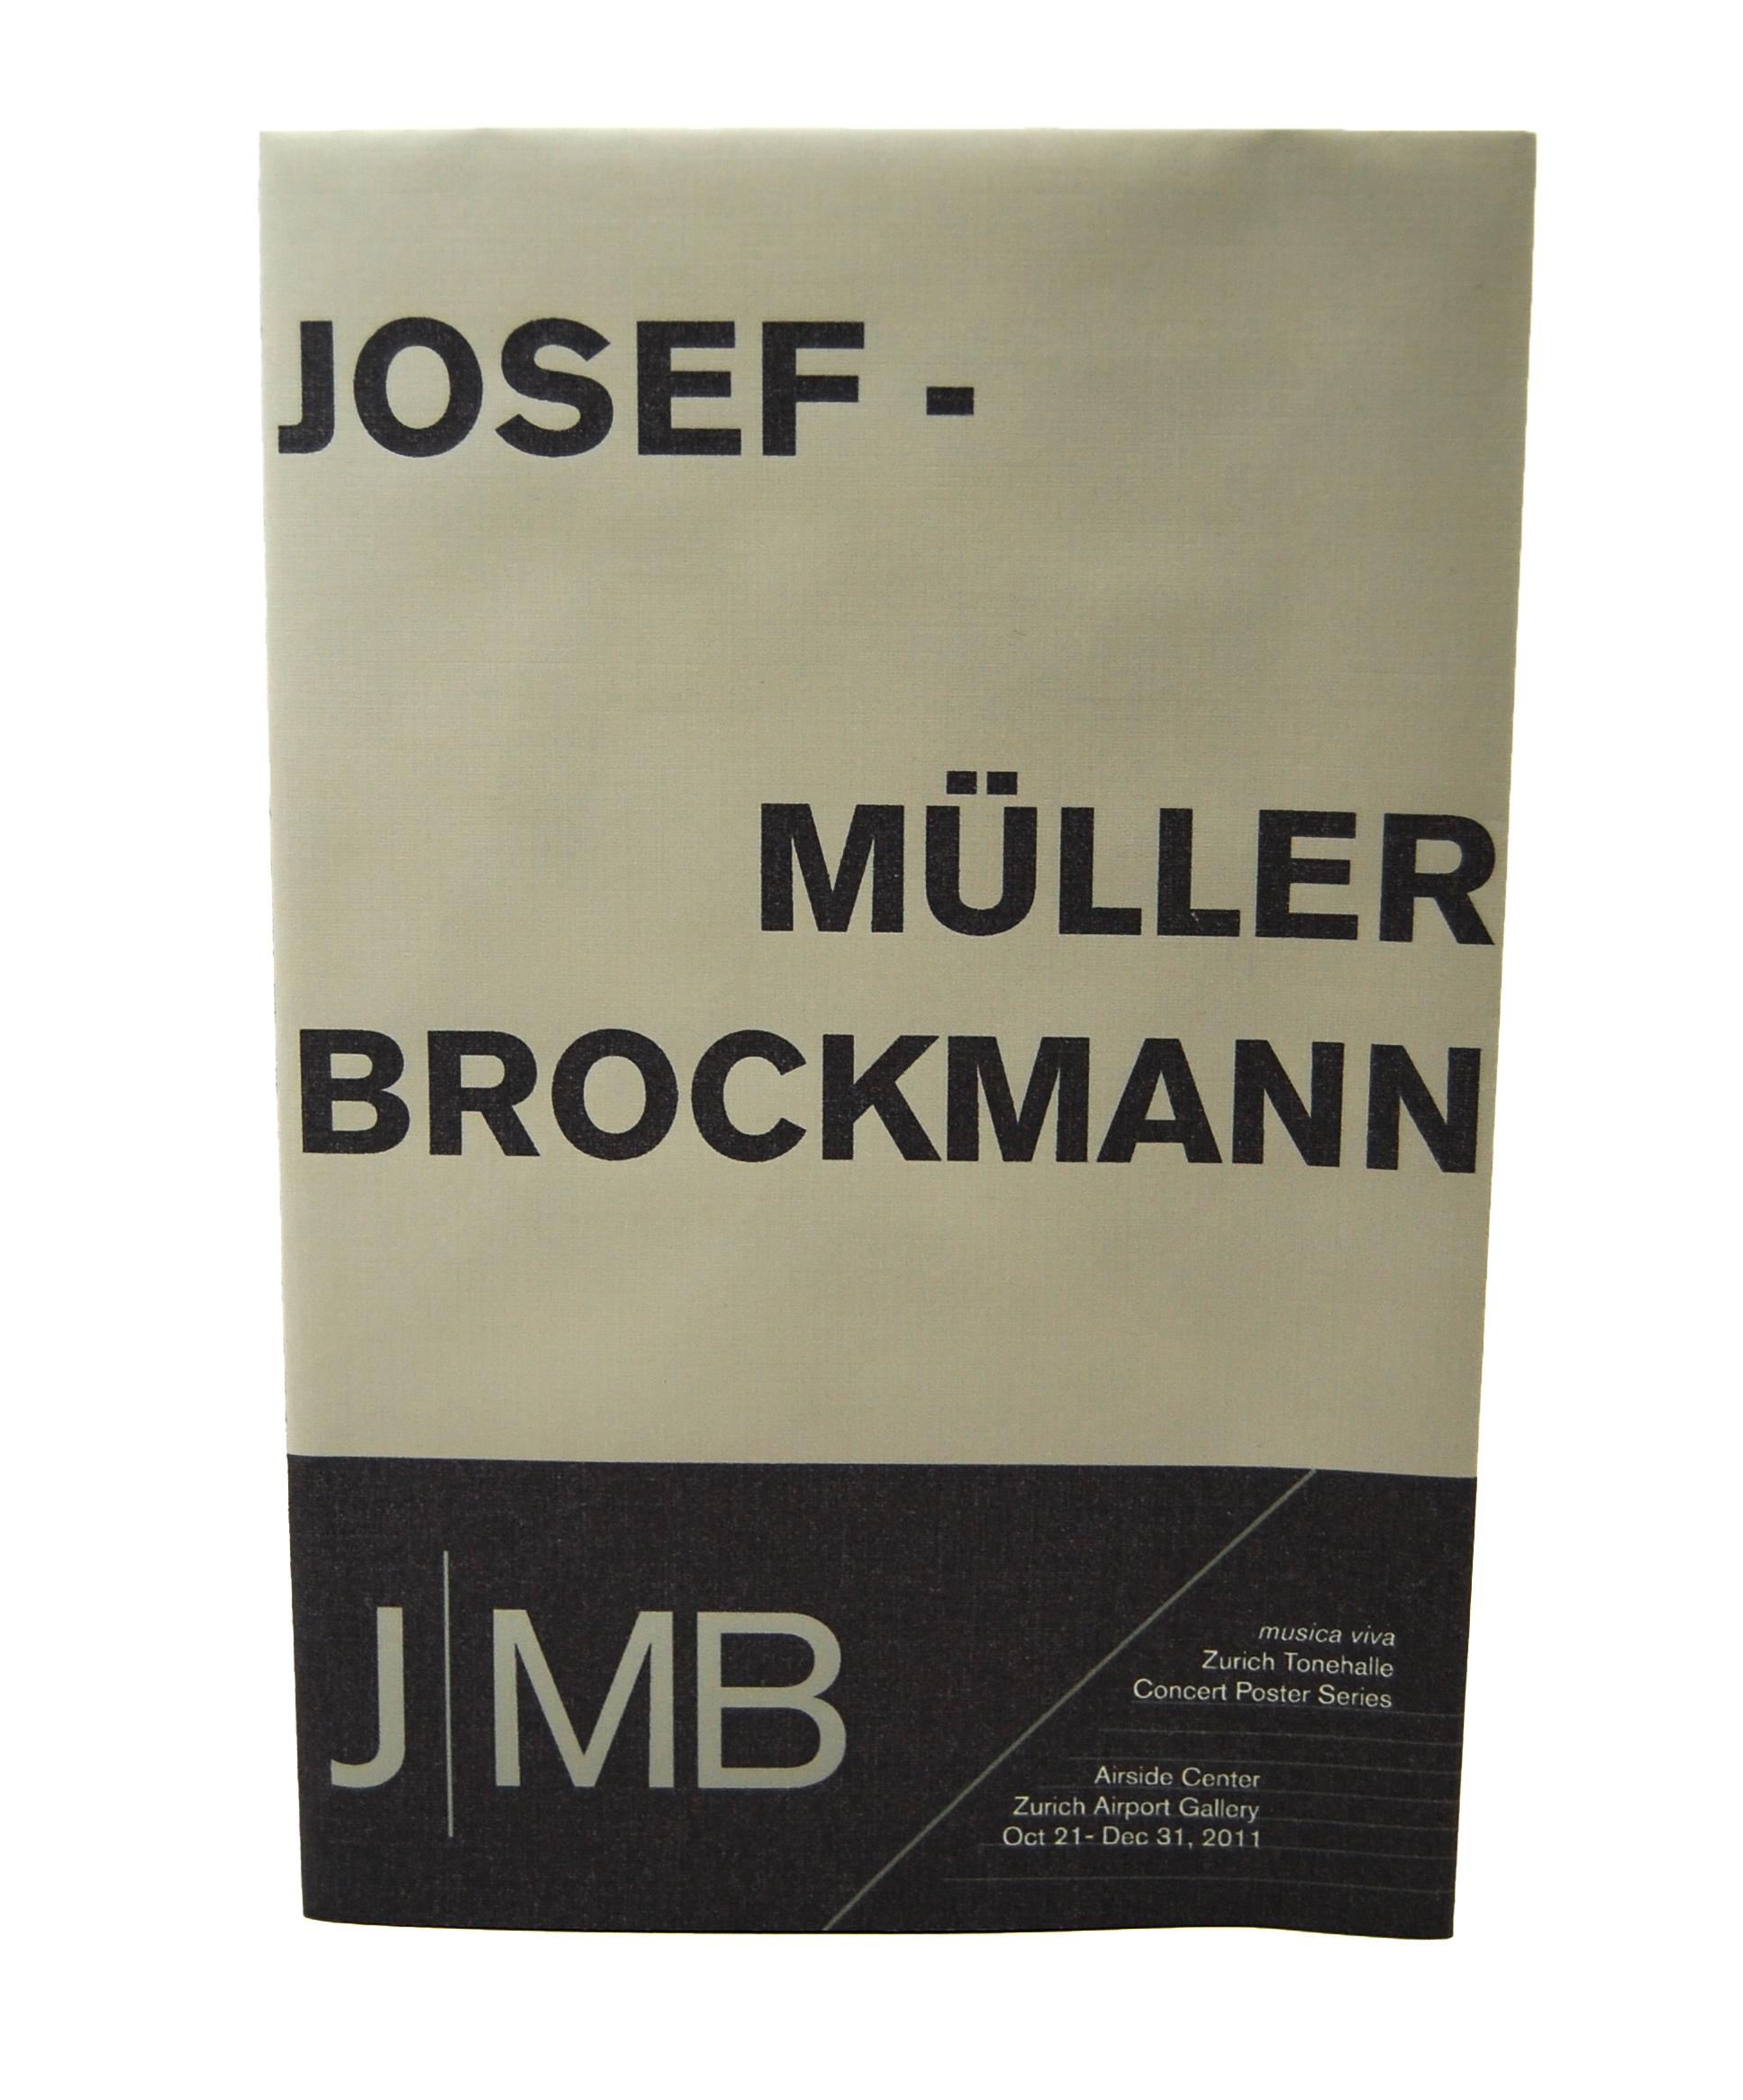 JMB_frontcover.jpg